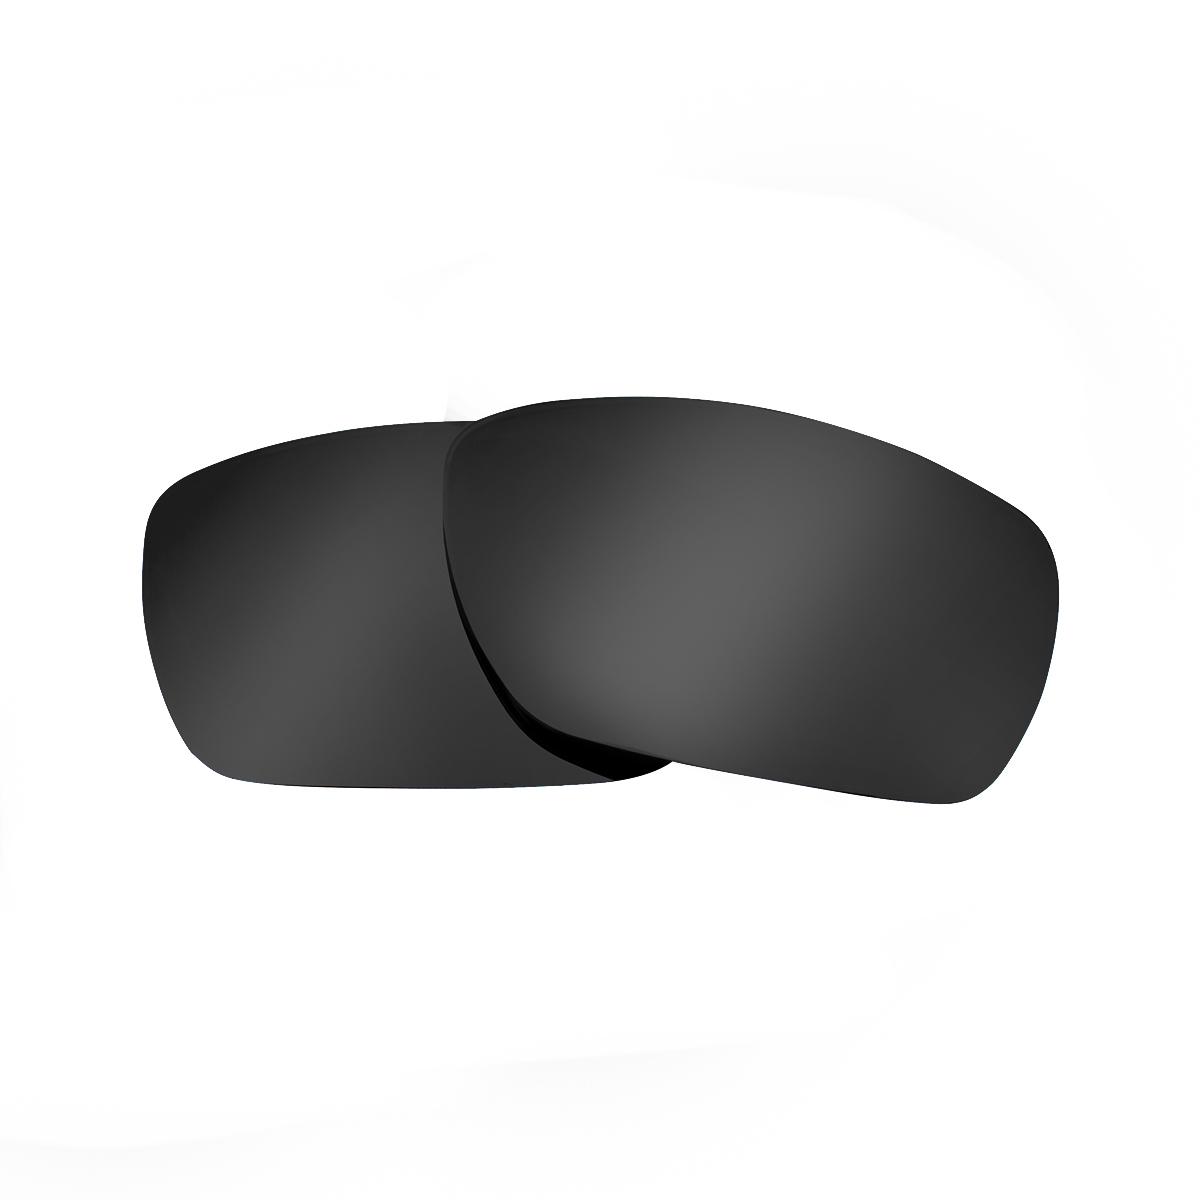 f51d959957 Details about Tinfoil Carbon Replacement Lenses Polarized Black Iridium by  SEEK fits OAKLEY